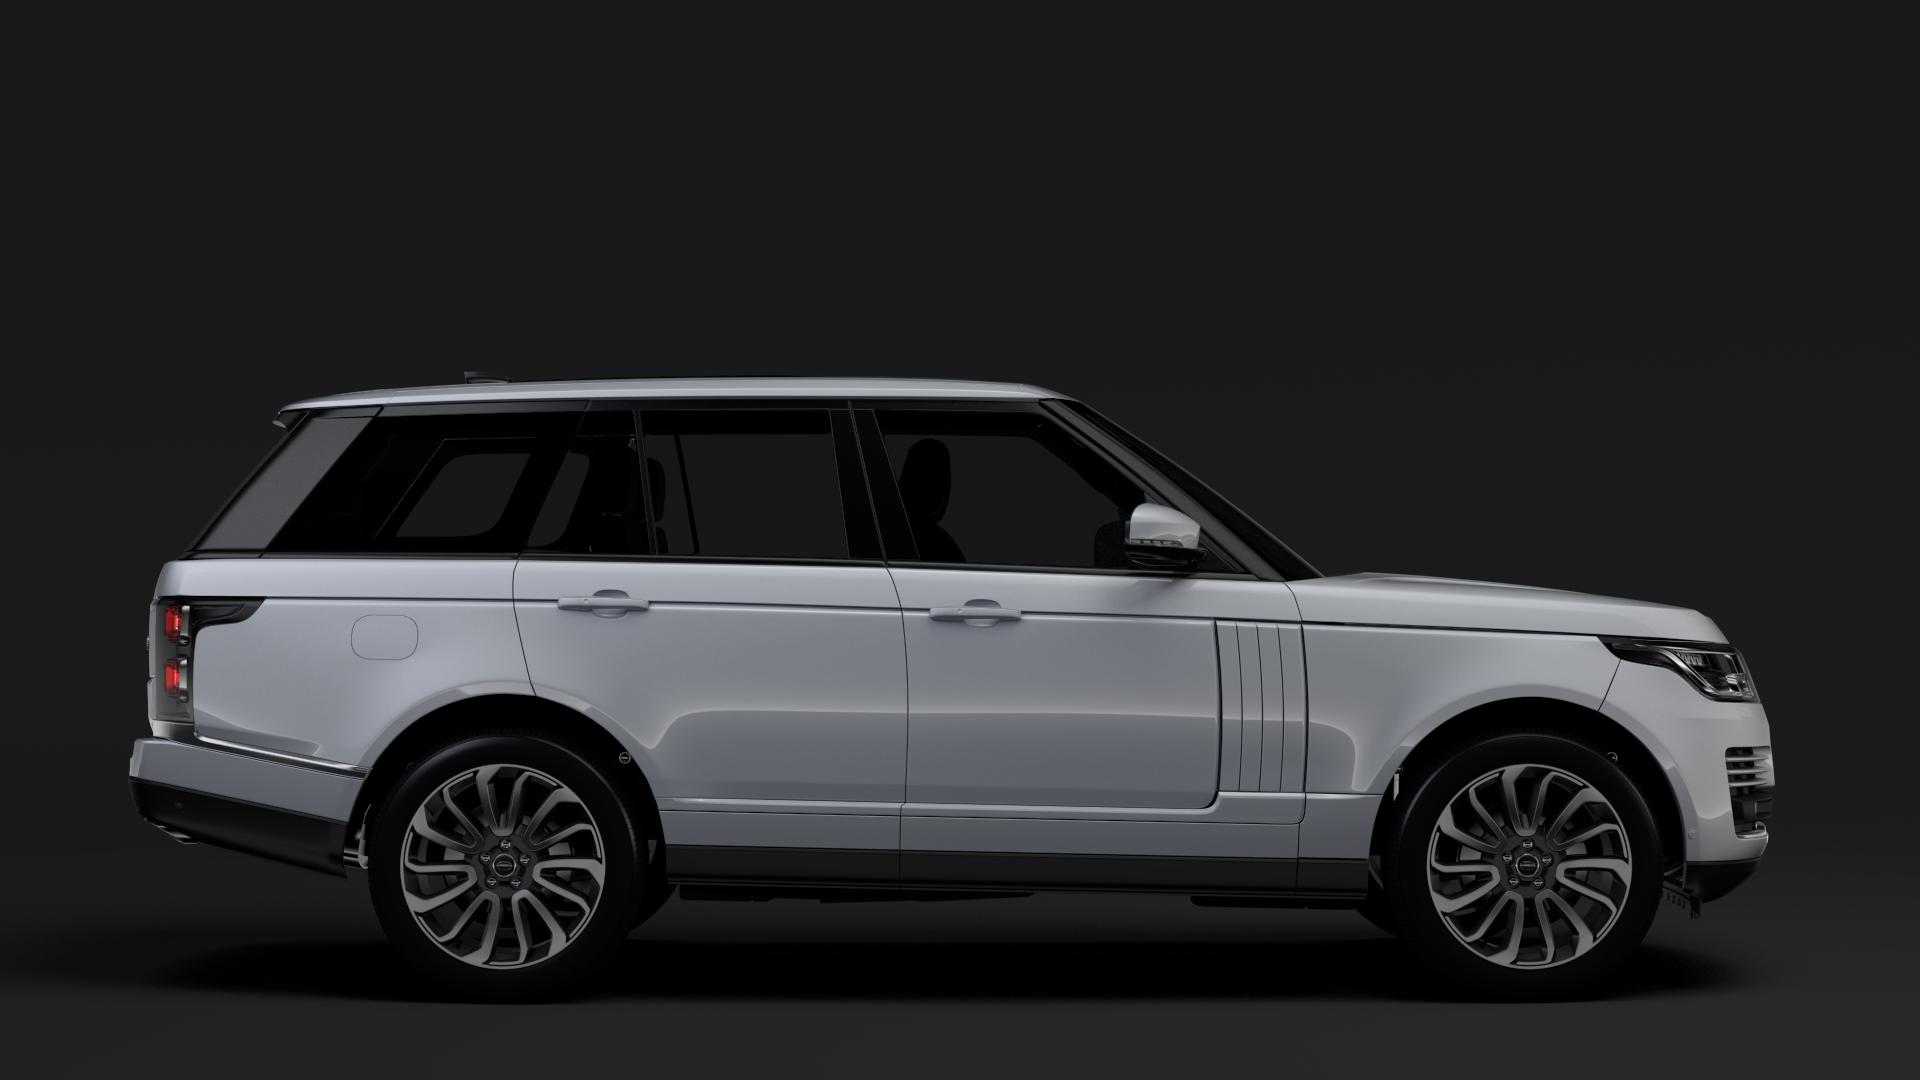 Range Rover Vogue SE L405 2018 3D Model